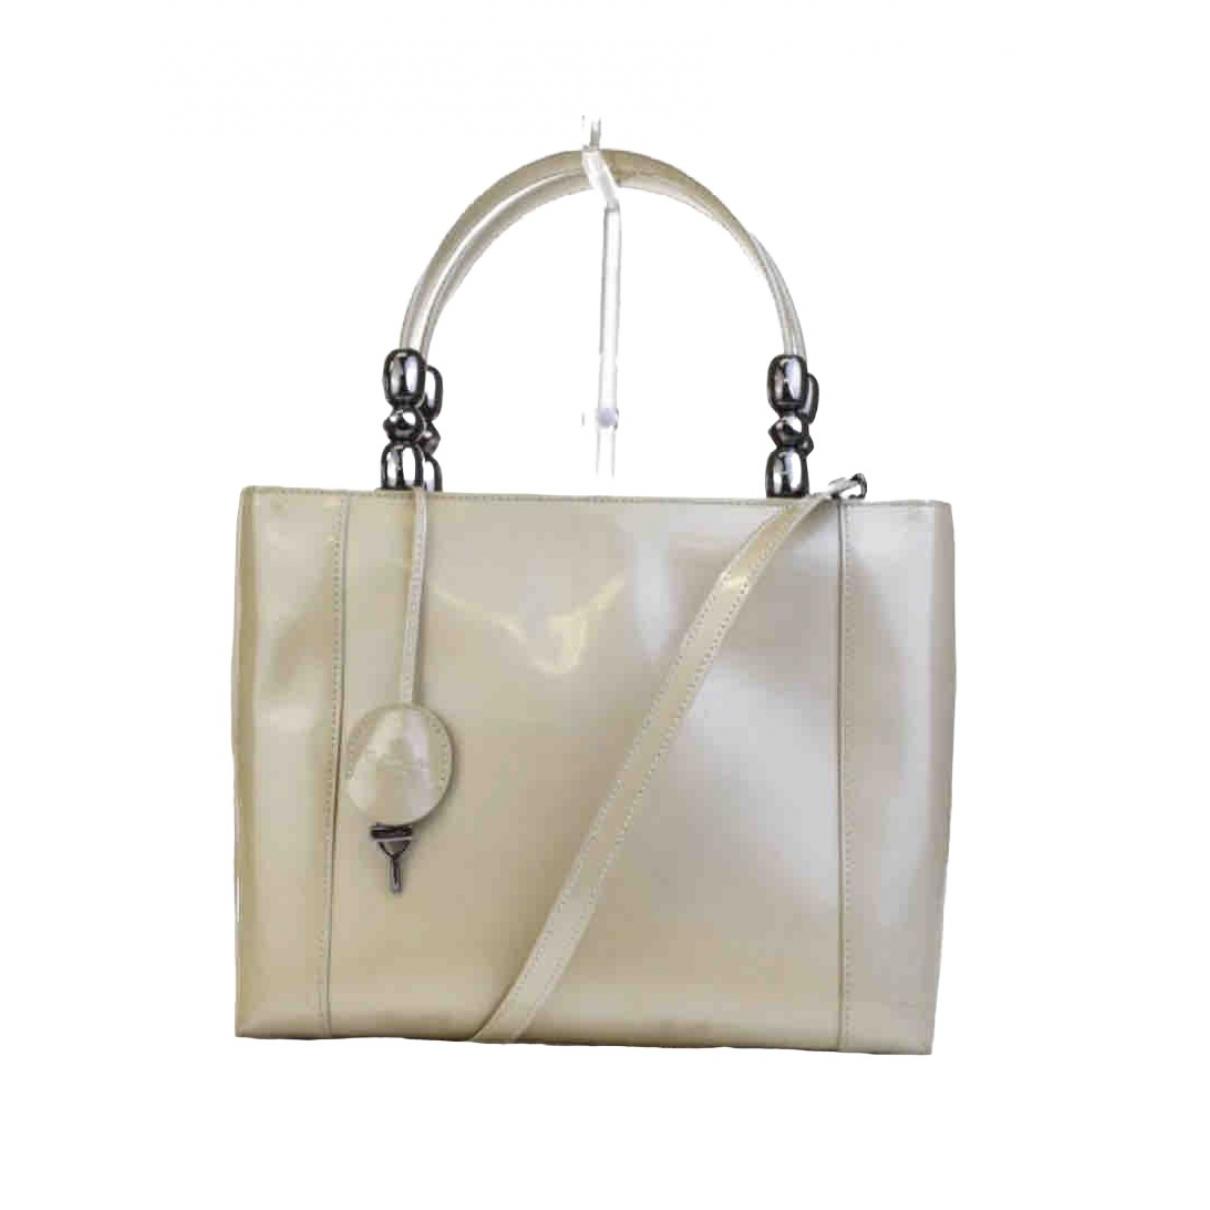 Dior Lady Perla Beige Patent leather handbag for Women \N